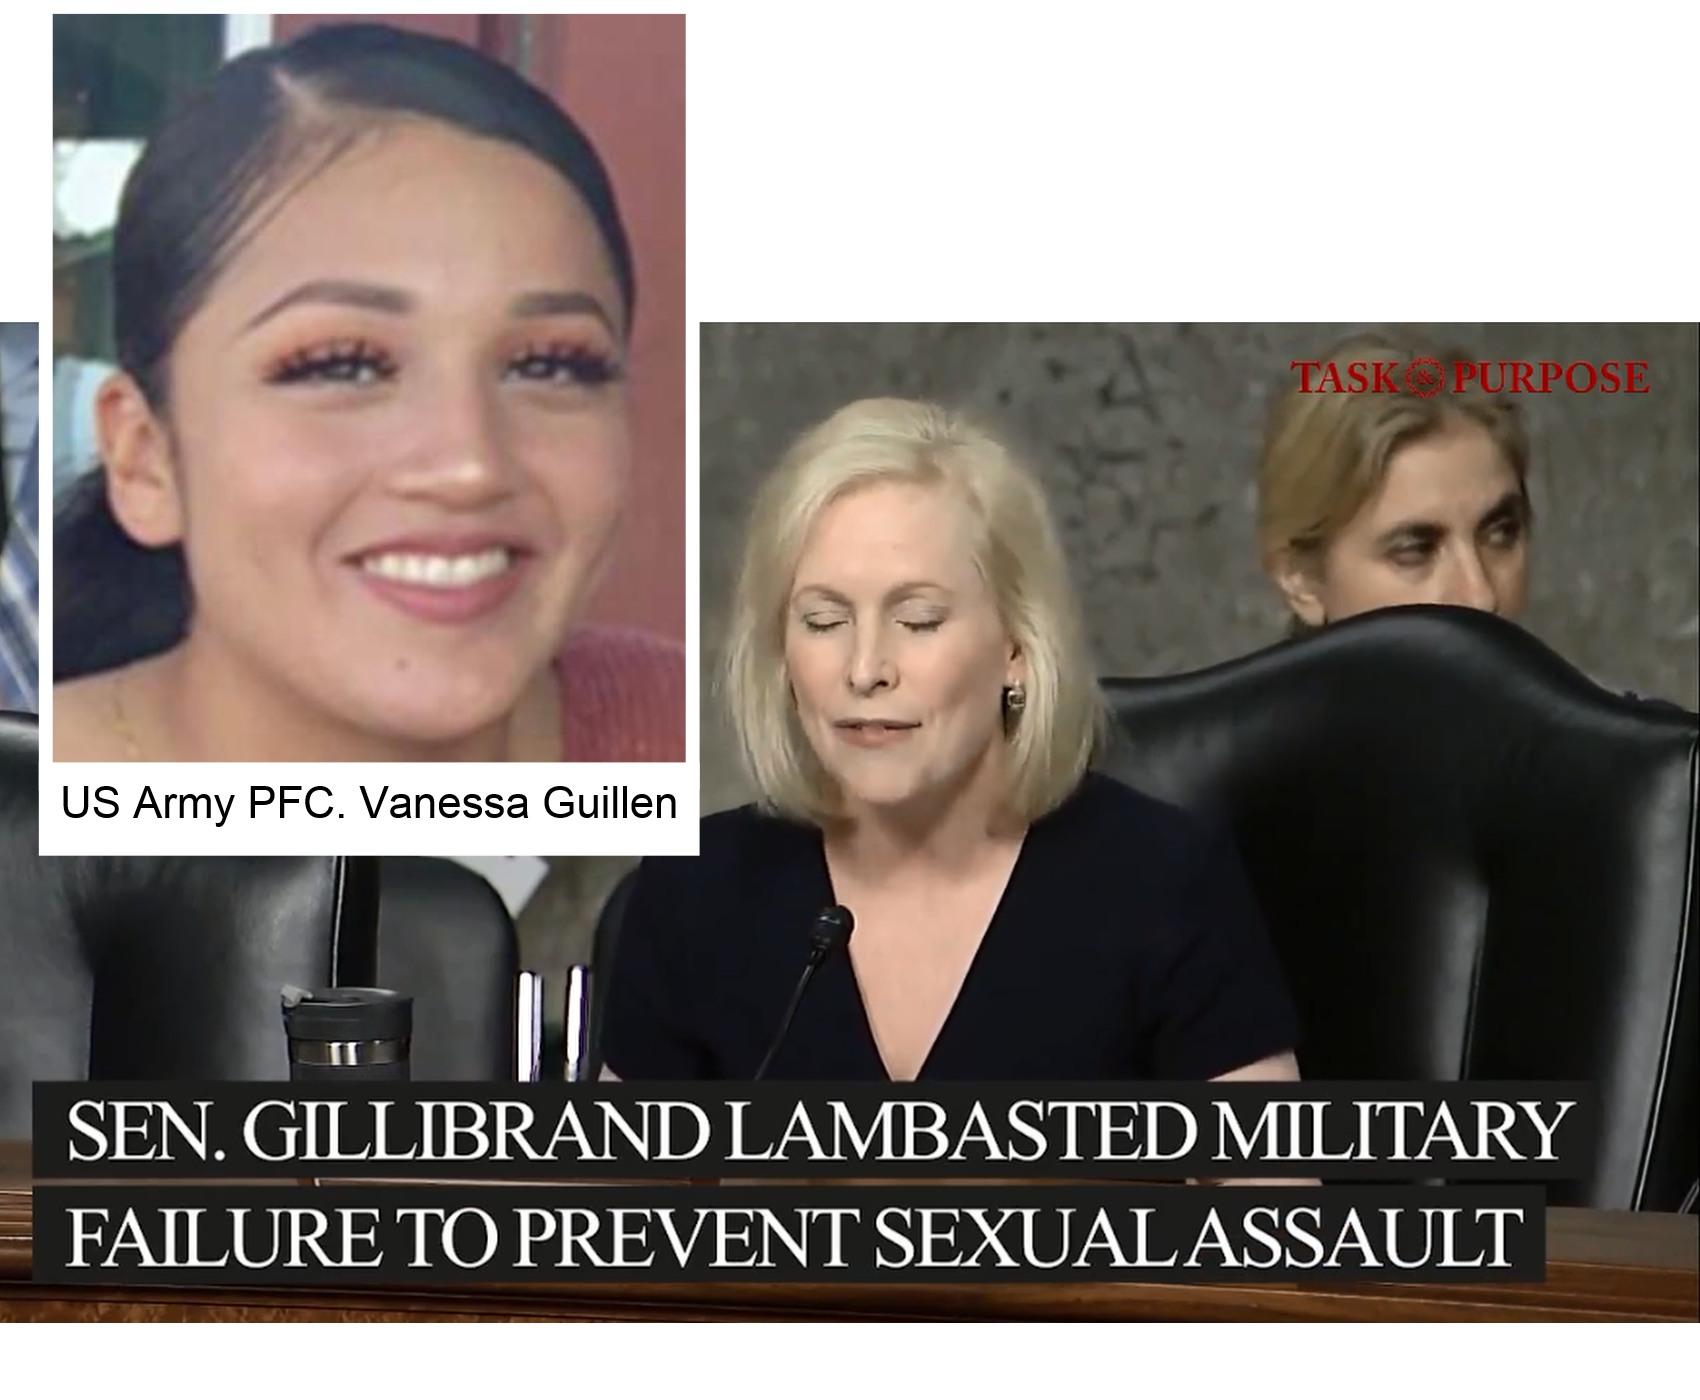 Senator blasts military